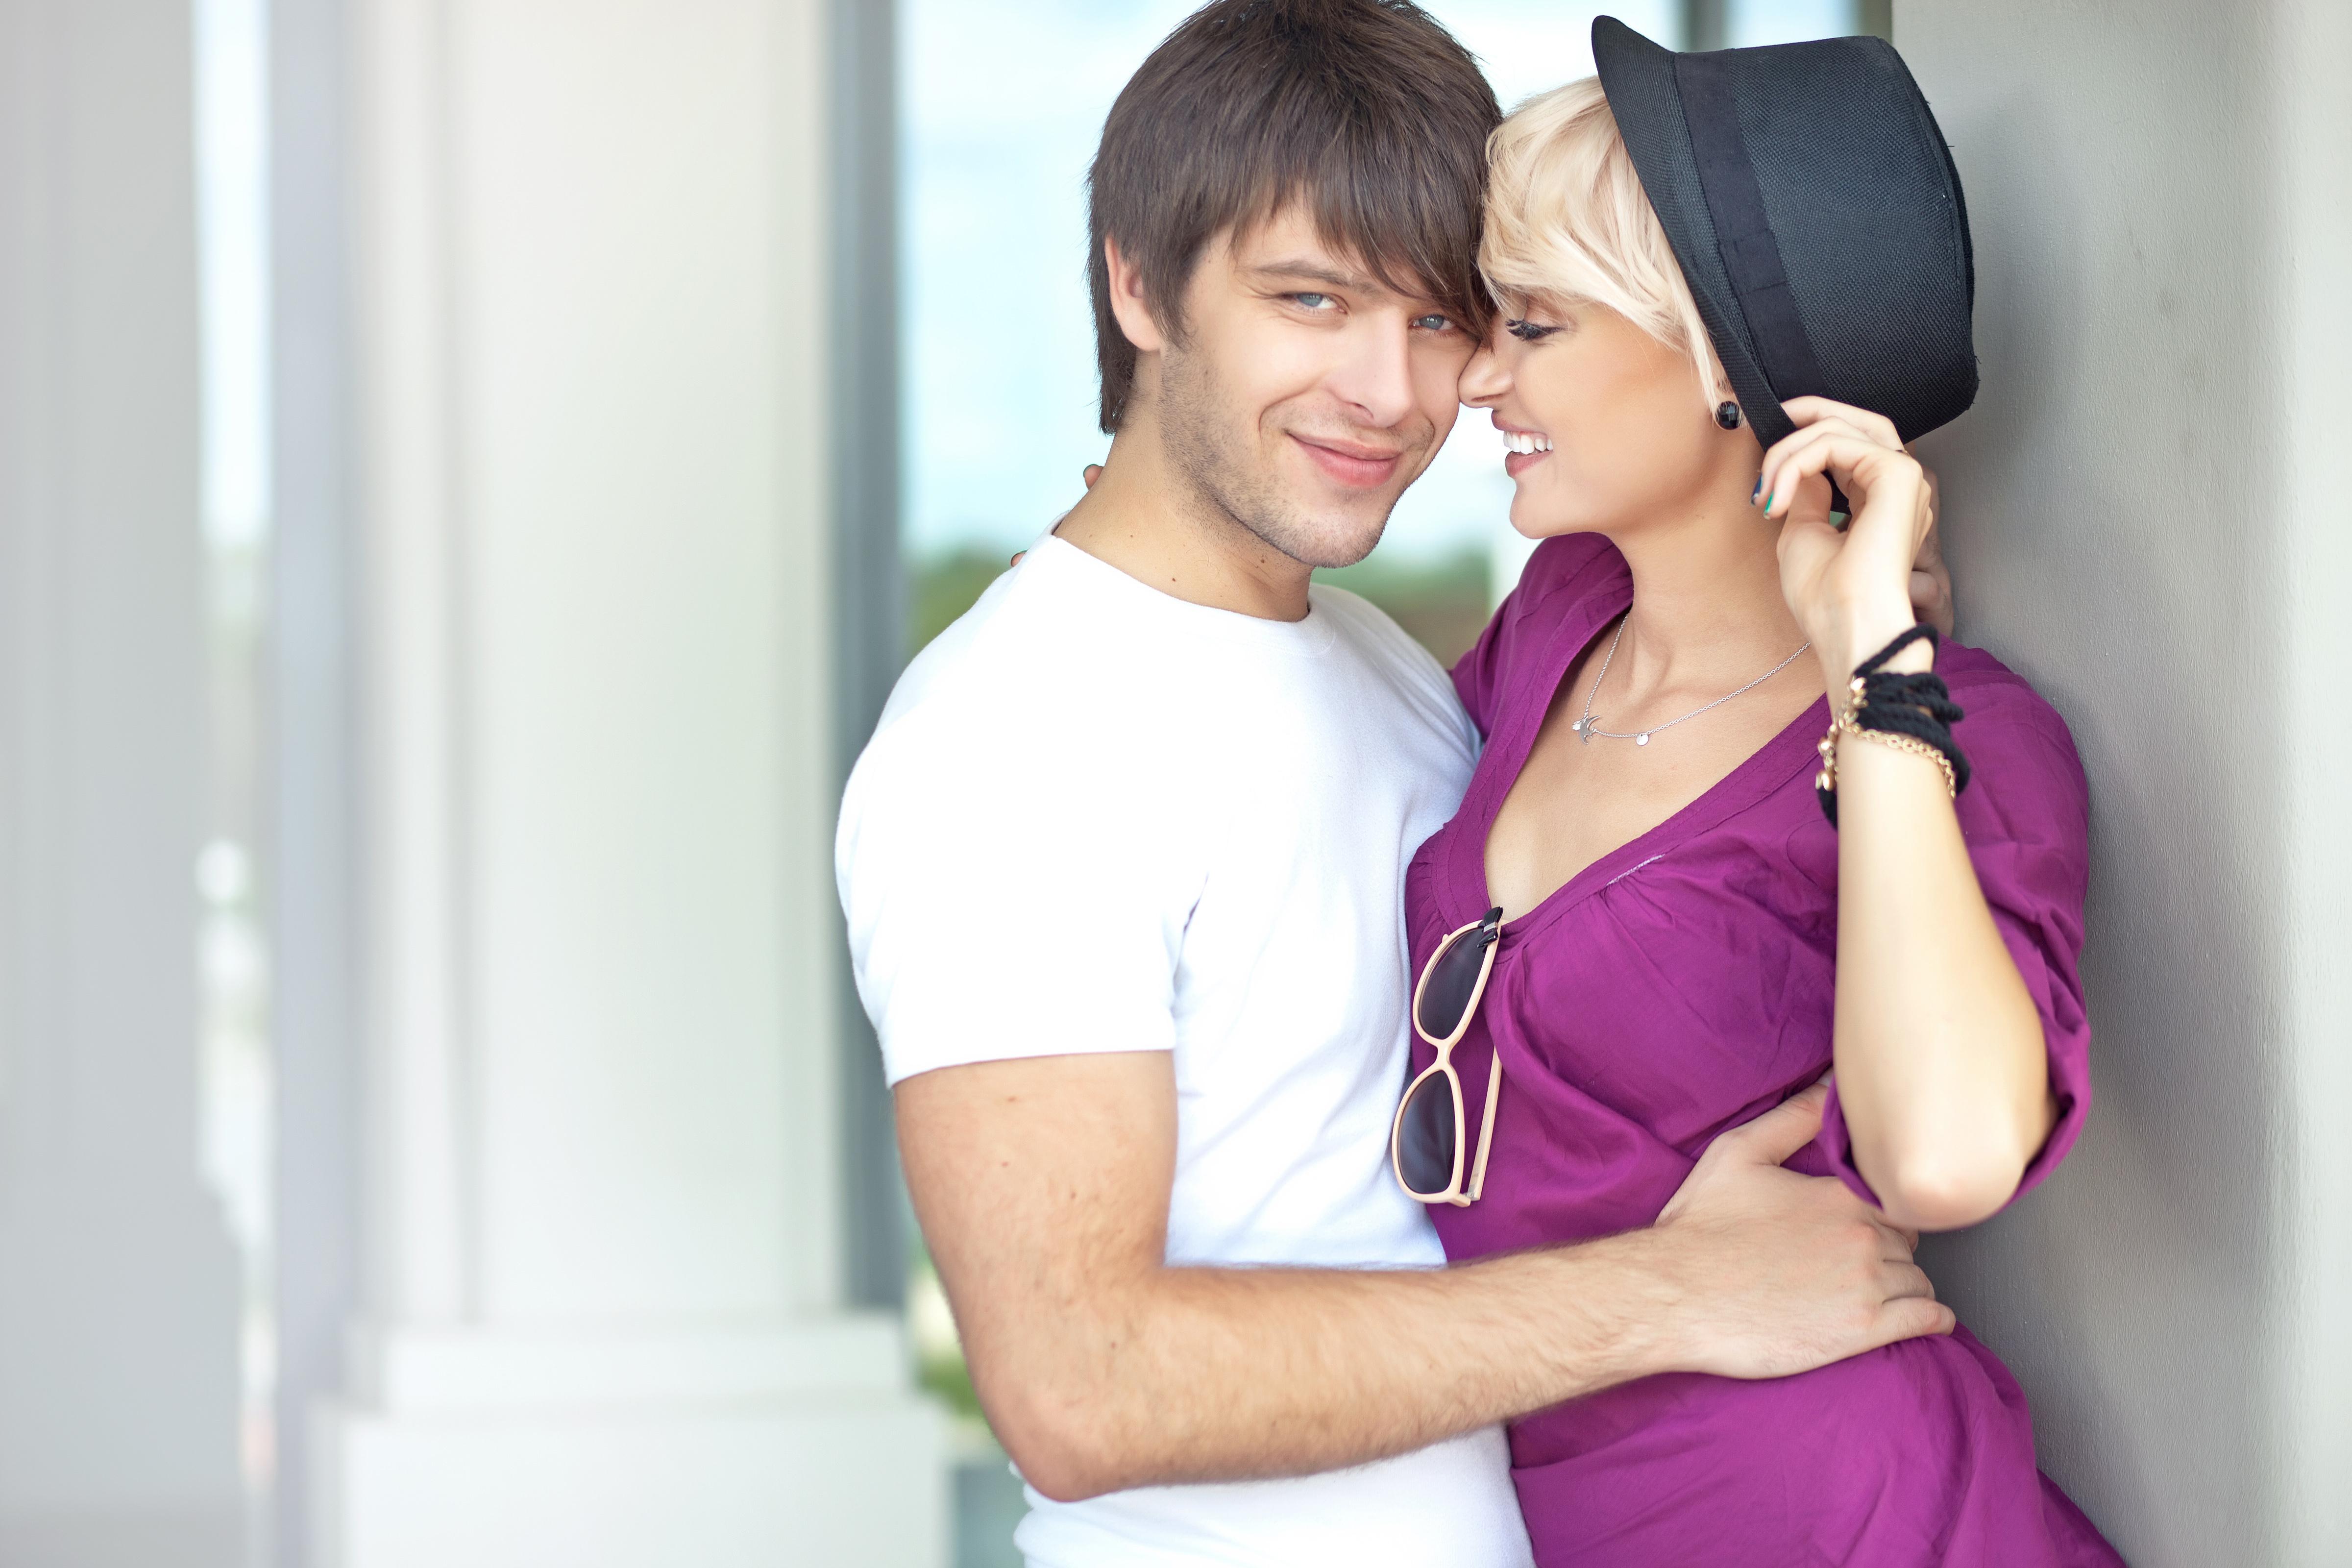 Image: Guy, girl, lovers, blonde, smile, hat, glasses